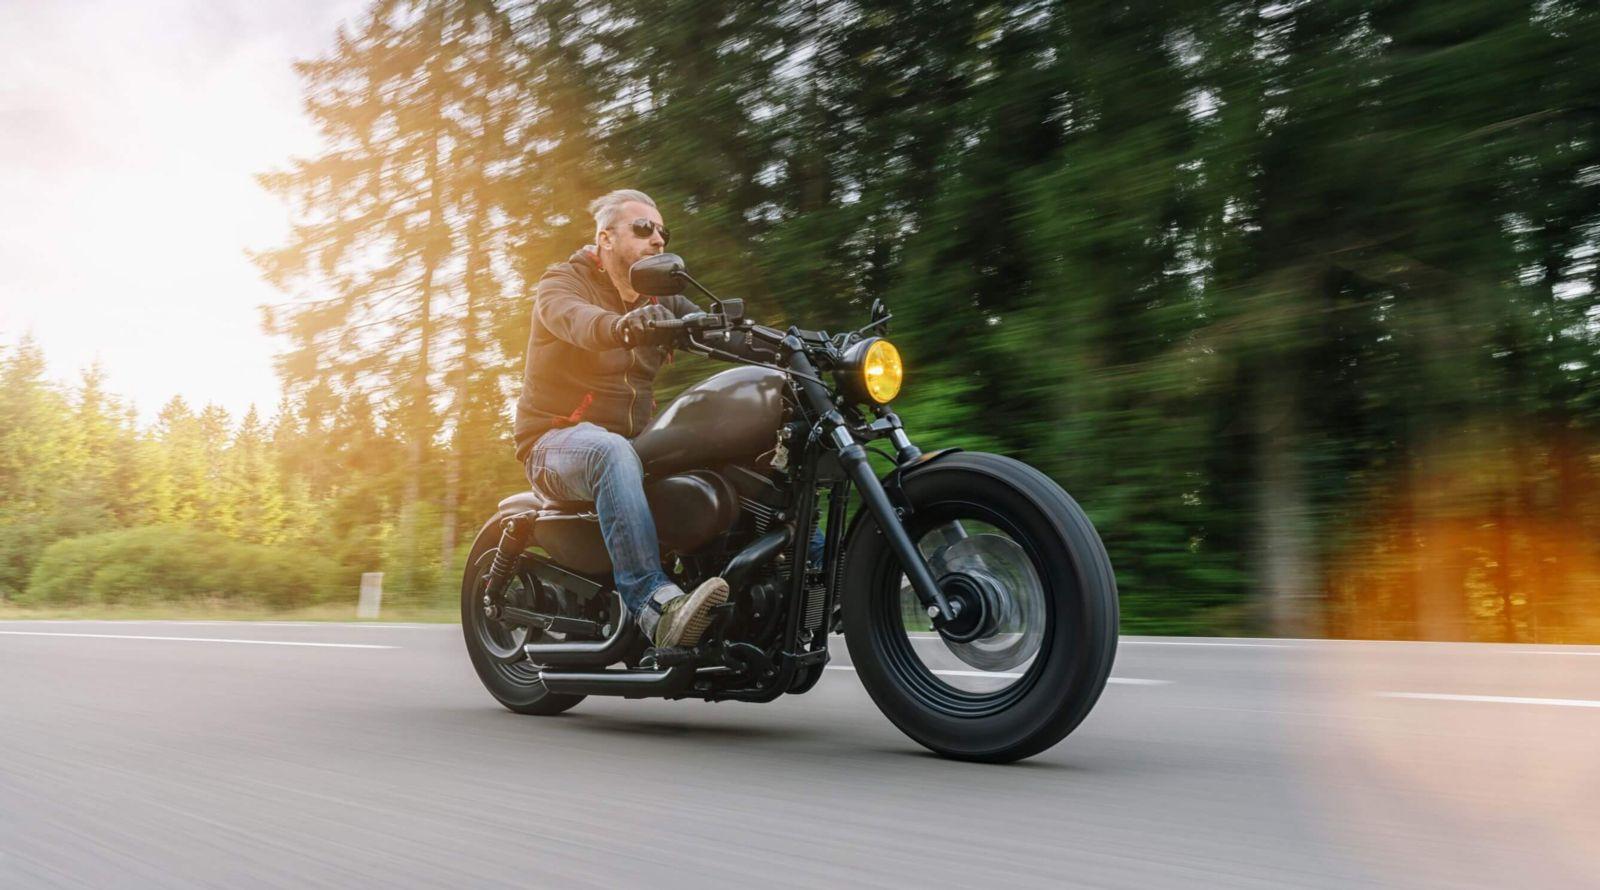 Missouri Motorcycle Laws